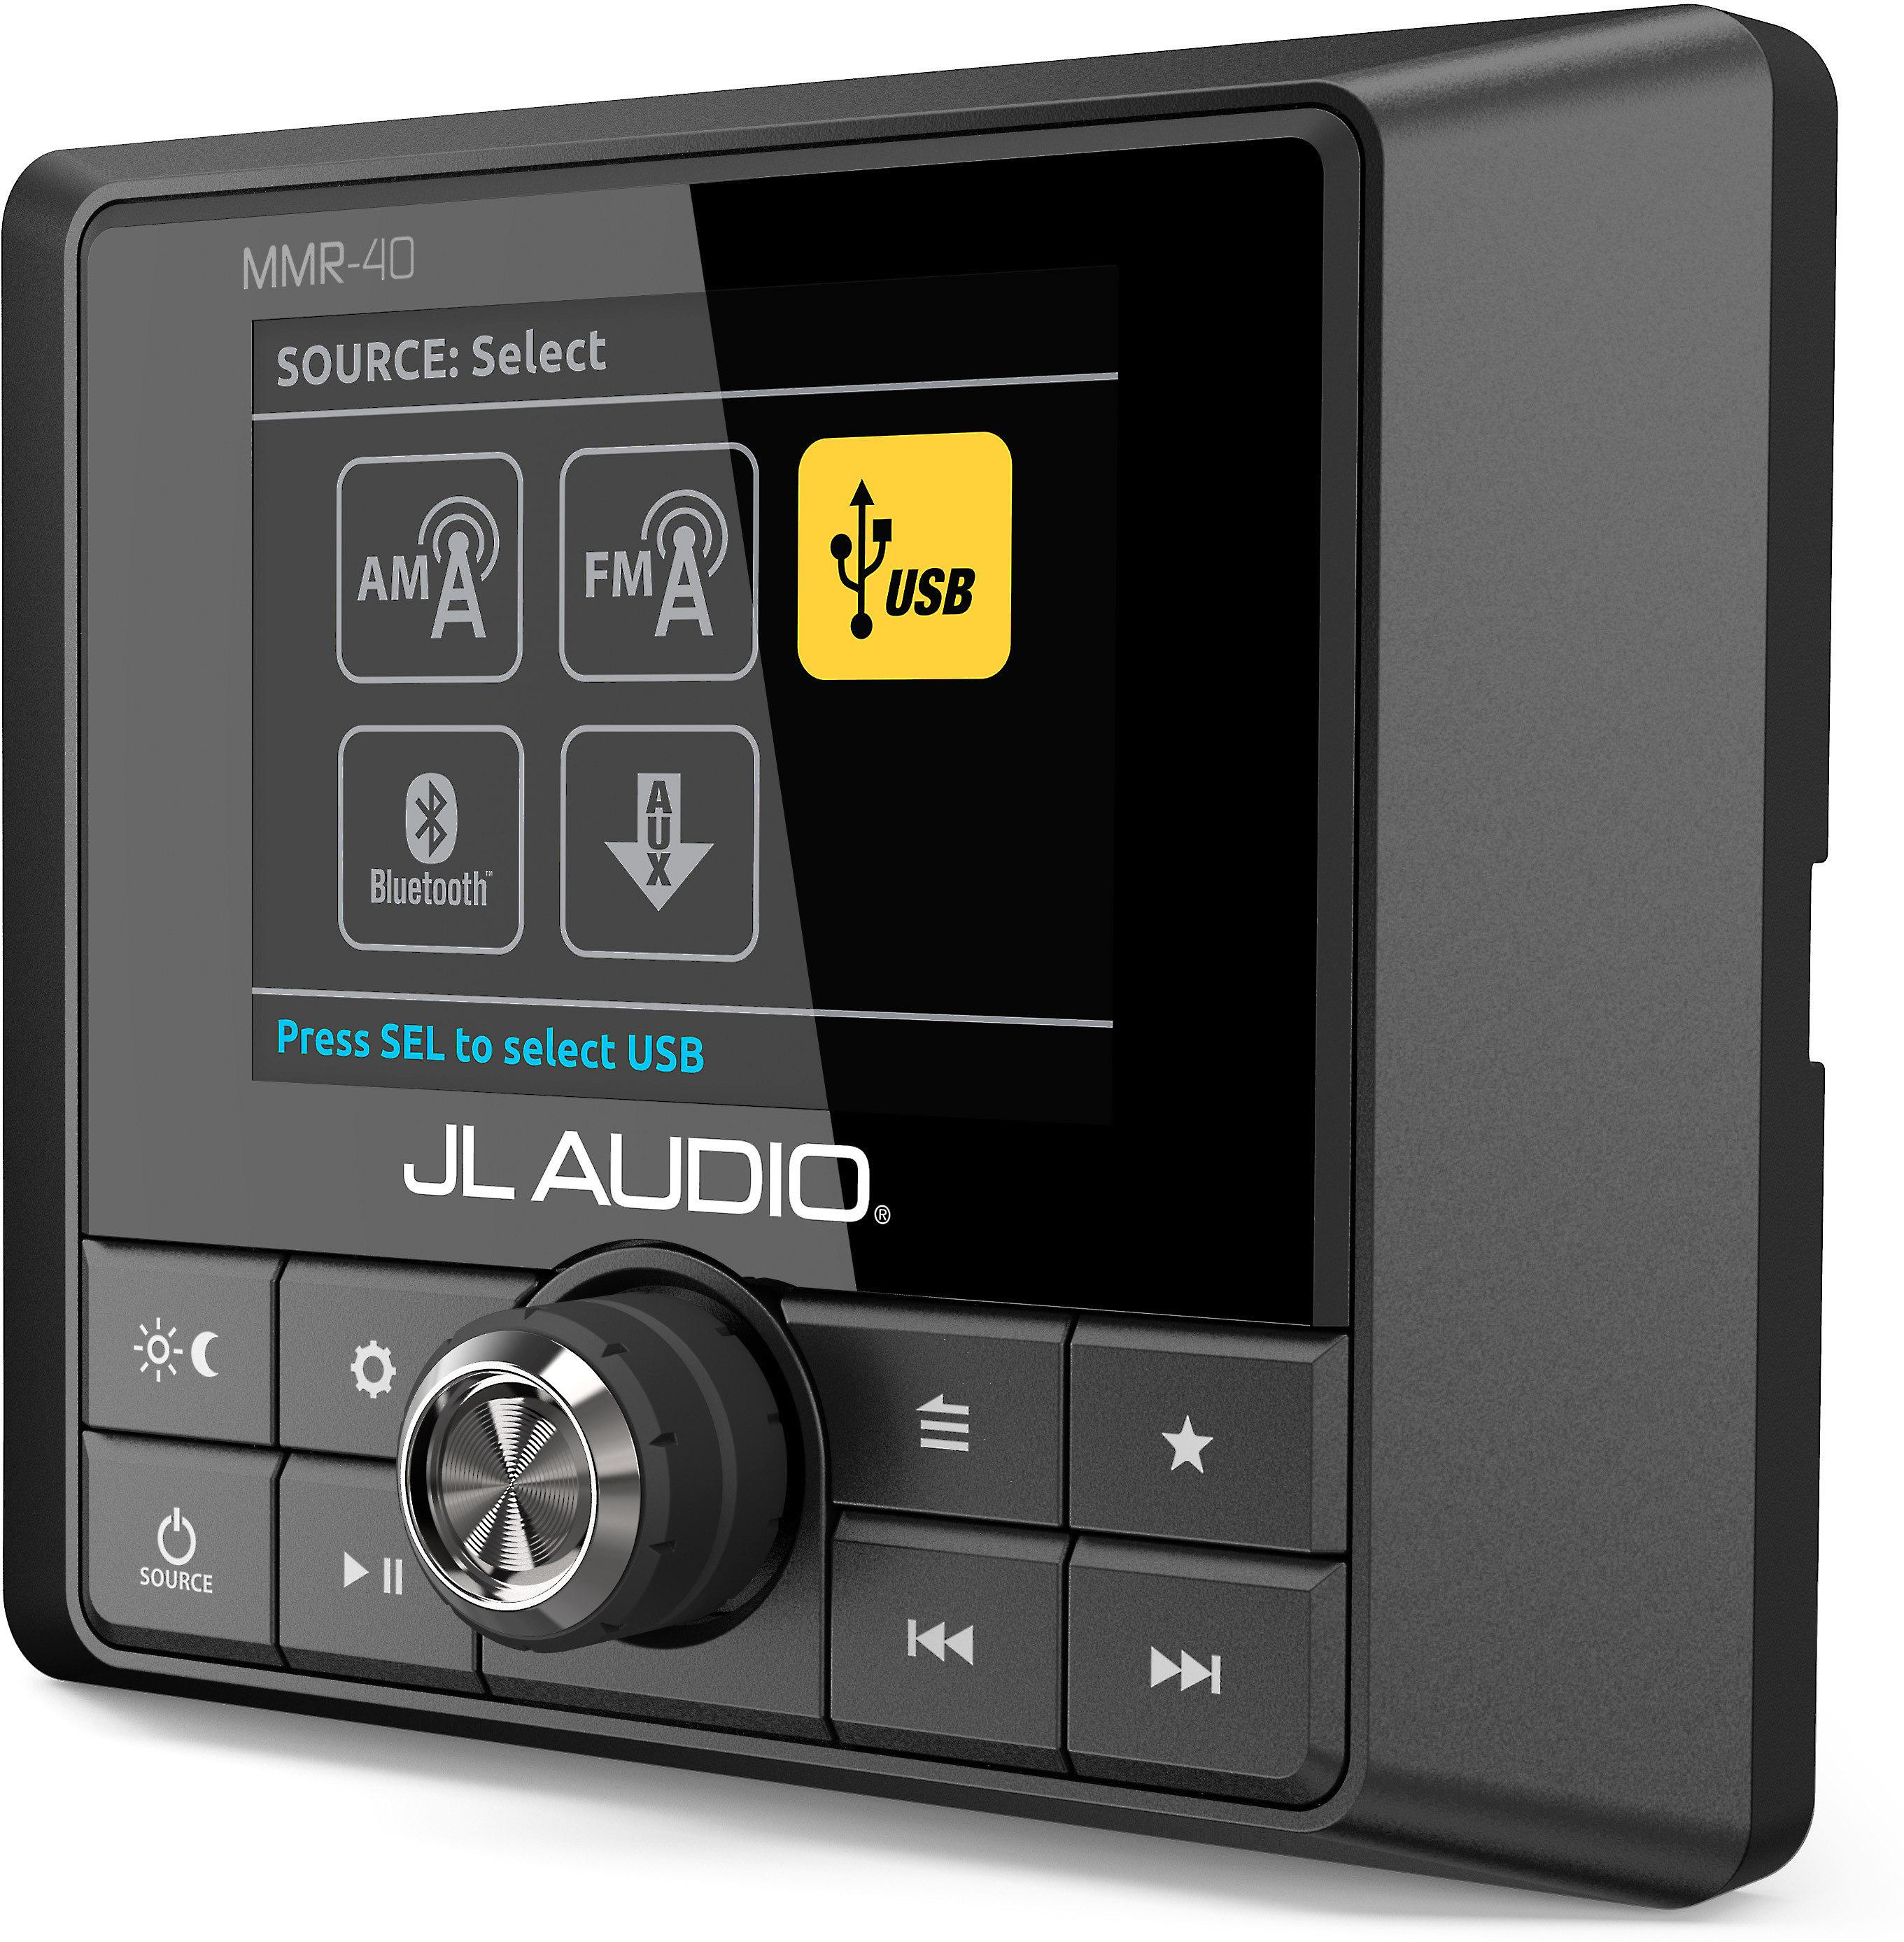 JL Audio MMR-40